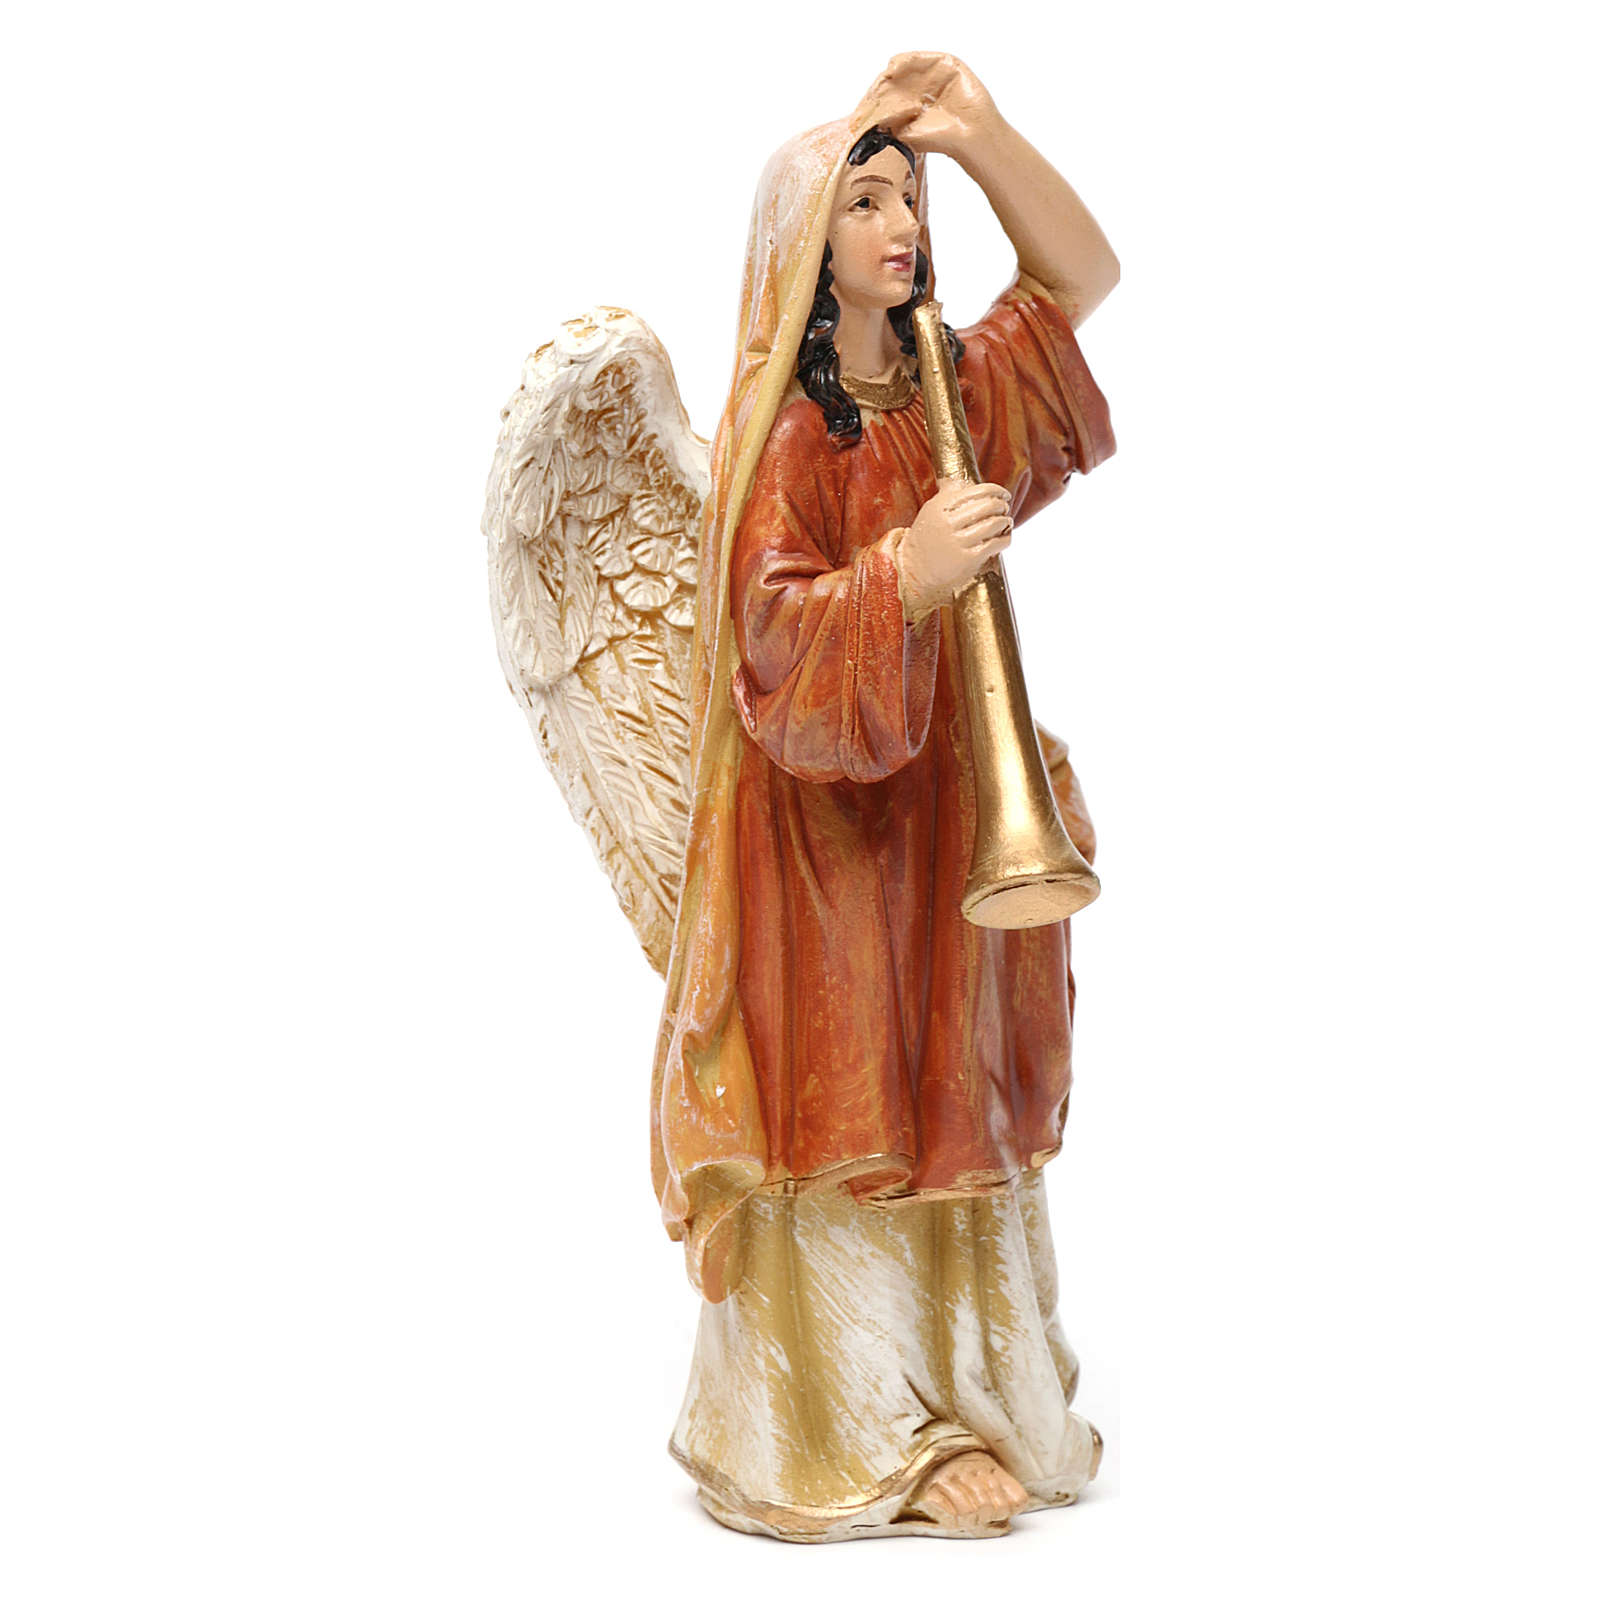 Angeli con strumenti in resina 3 pz per presepe da 13 cm  3